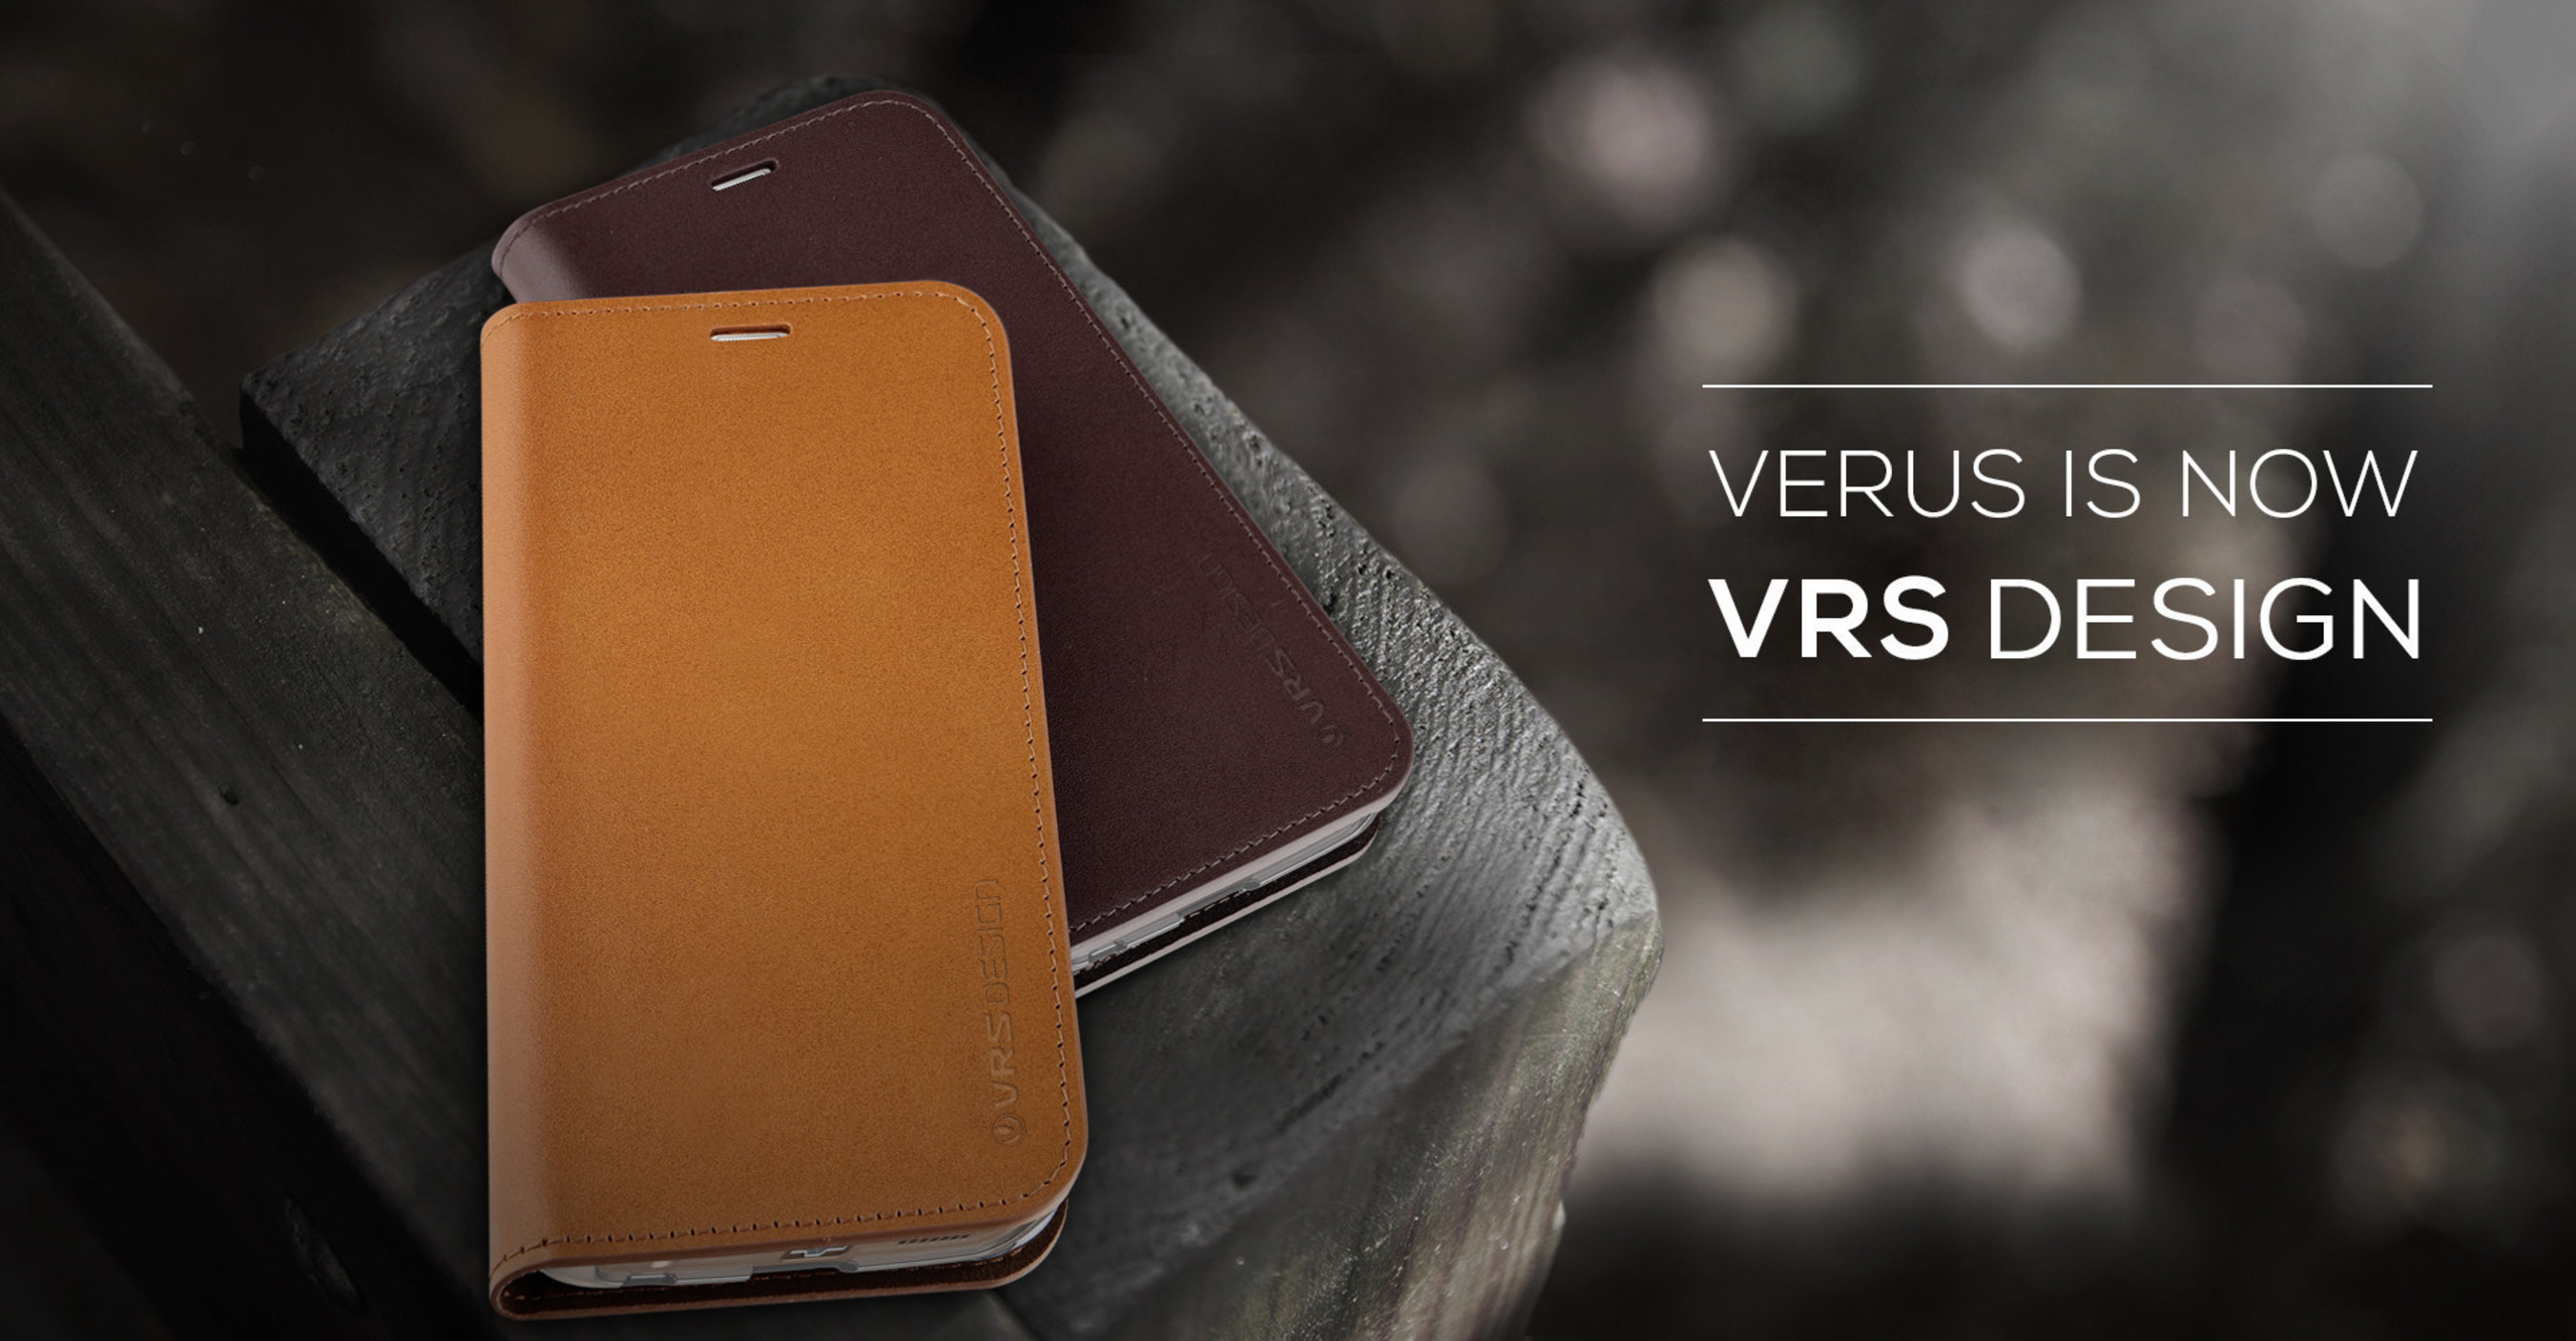 Verus Rebrands as VRS Design